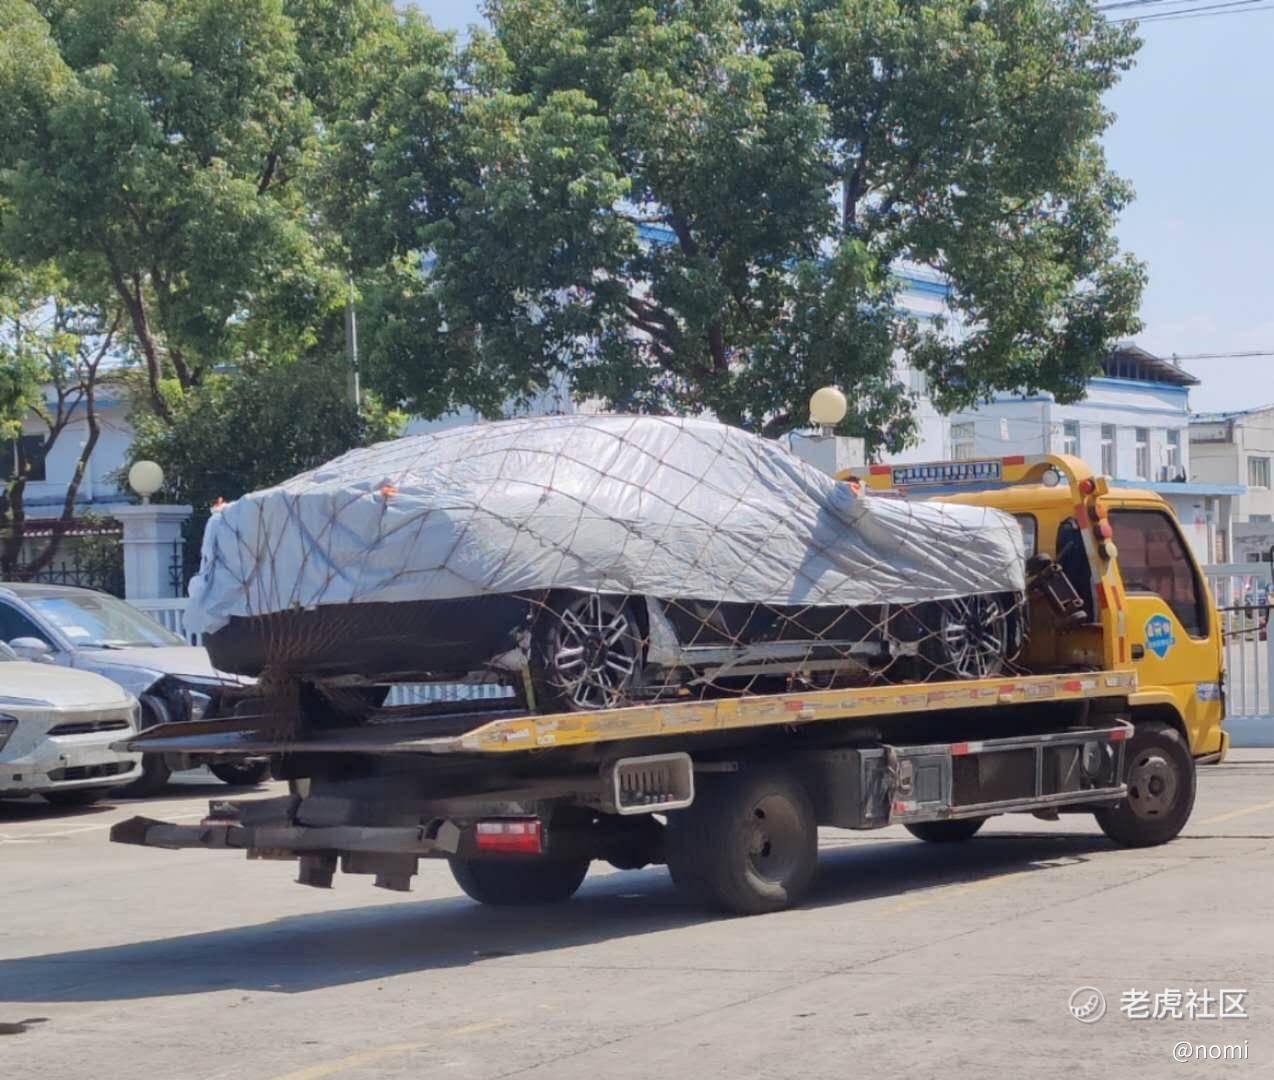 Suspected Nio Ee7 Sedan Spy Photo Revealed Cntechpost